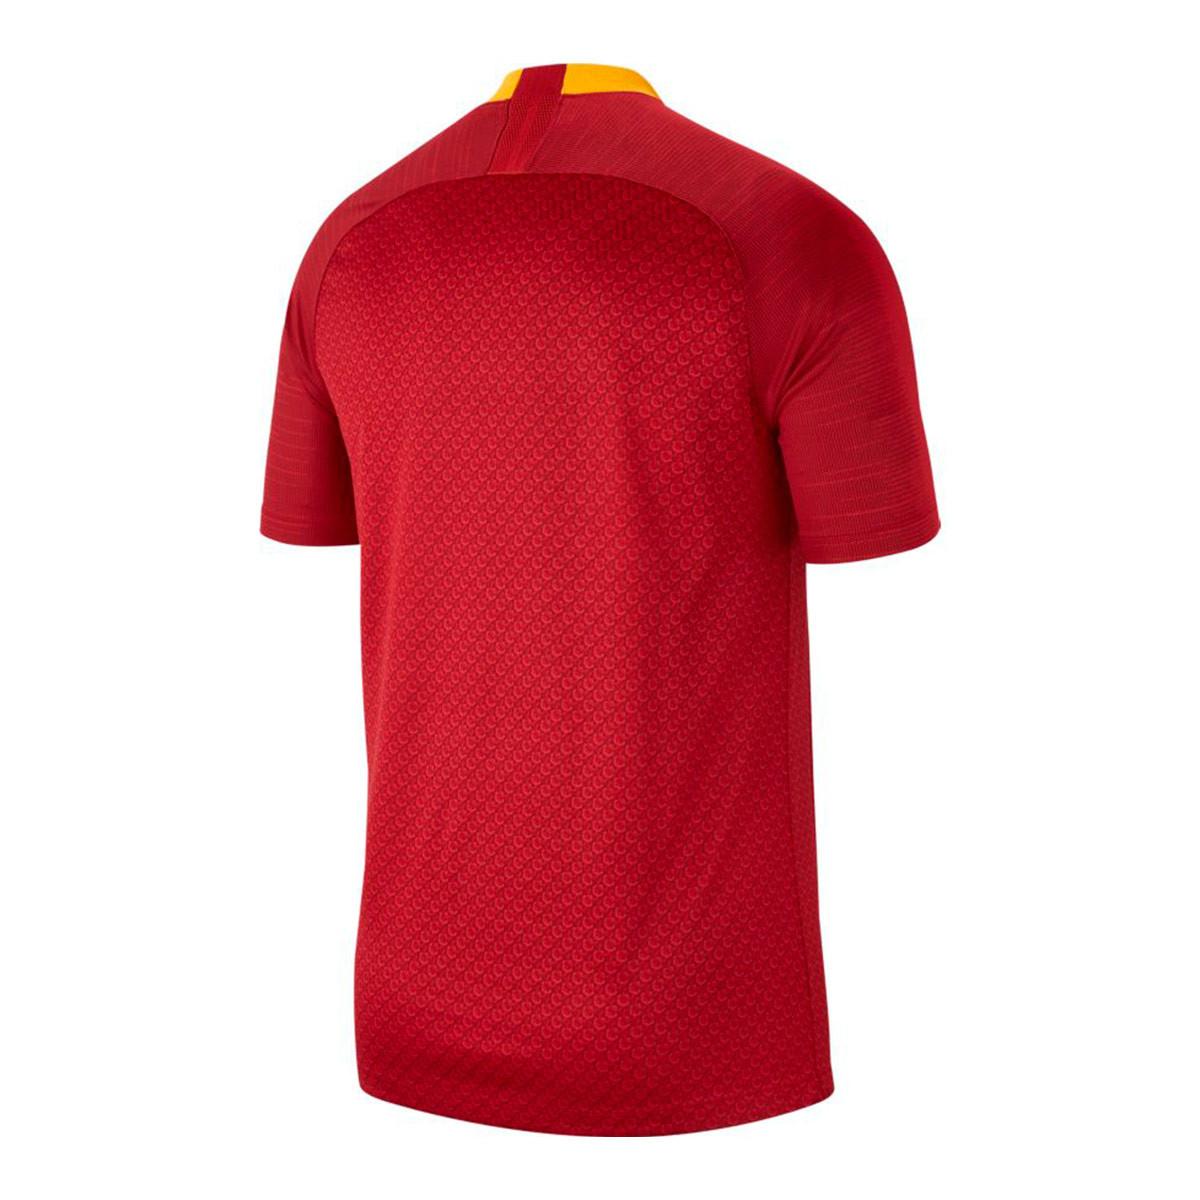 2f0b613ee33f8 Jersey Nike AS Roma Stadium 2018-2019 Home Team red-University gold ...